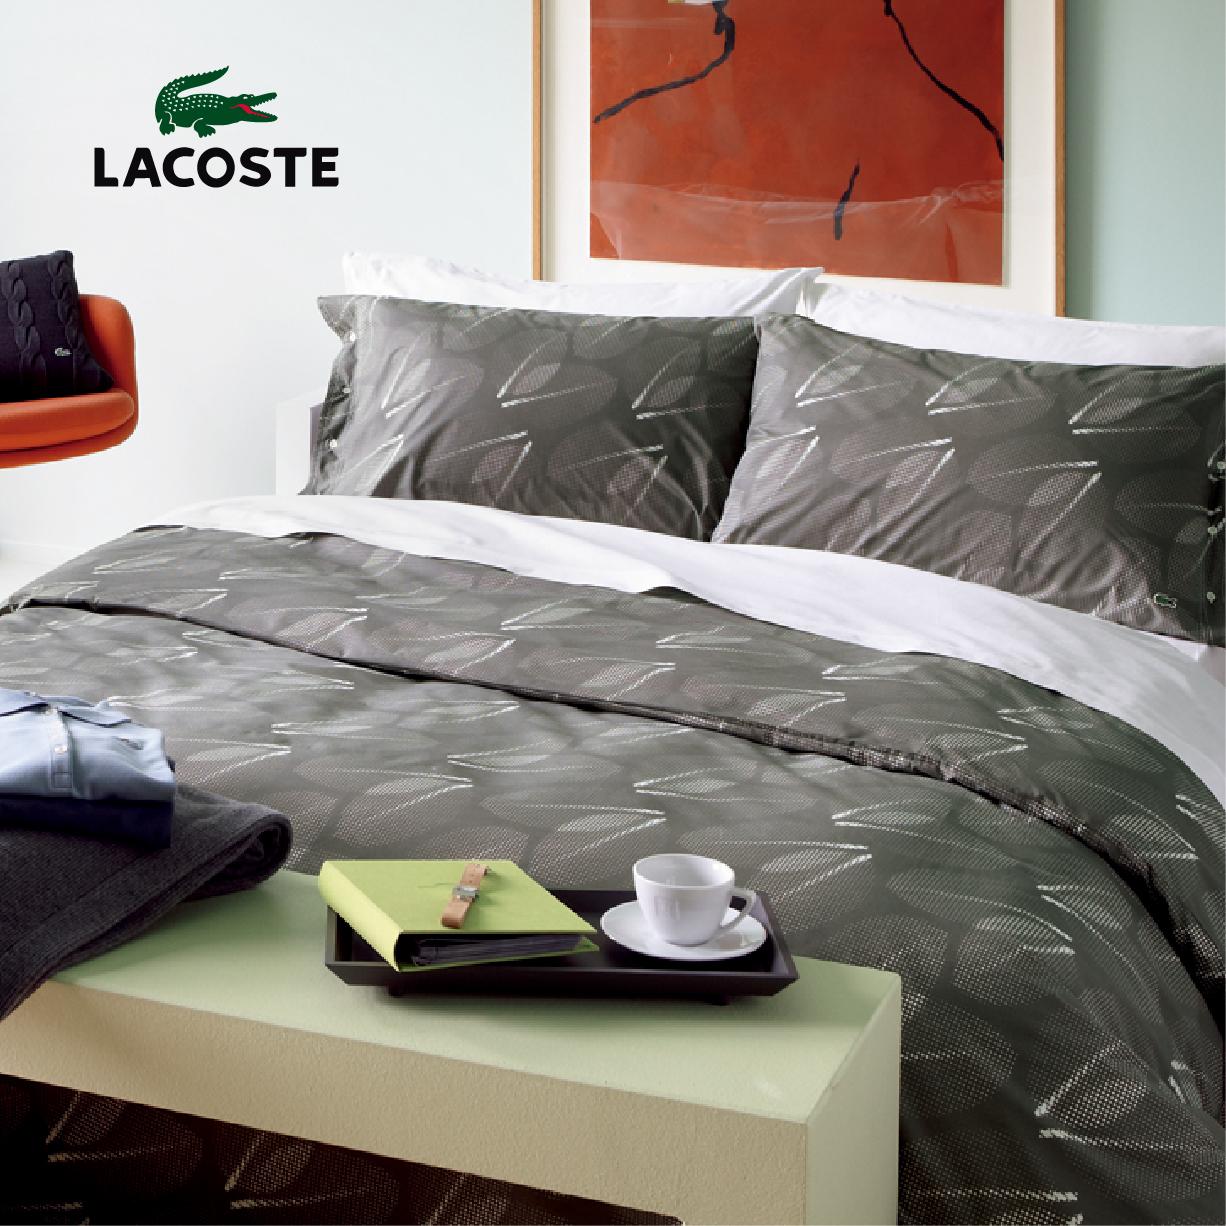 【LACOSTE】法國原裝加大床組ALUDRA